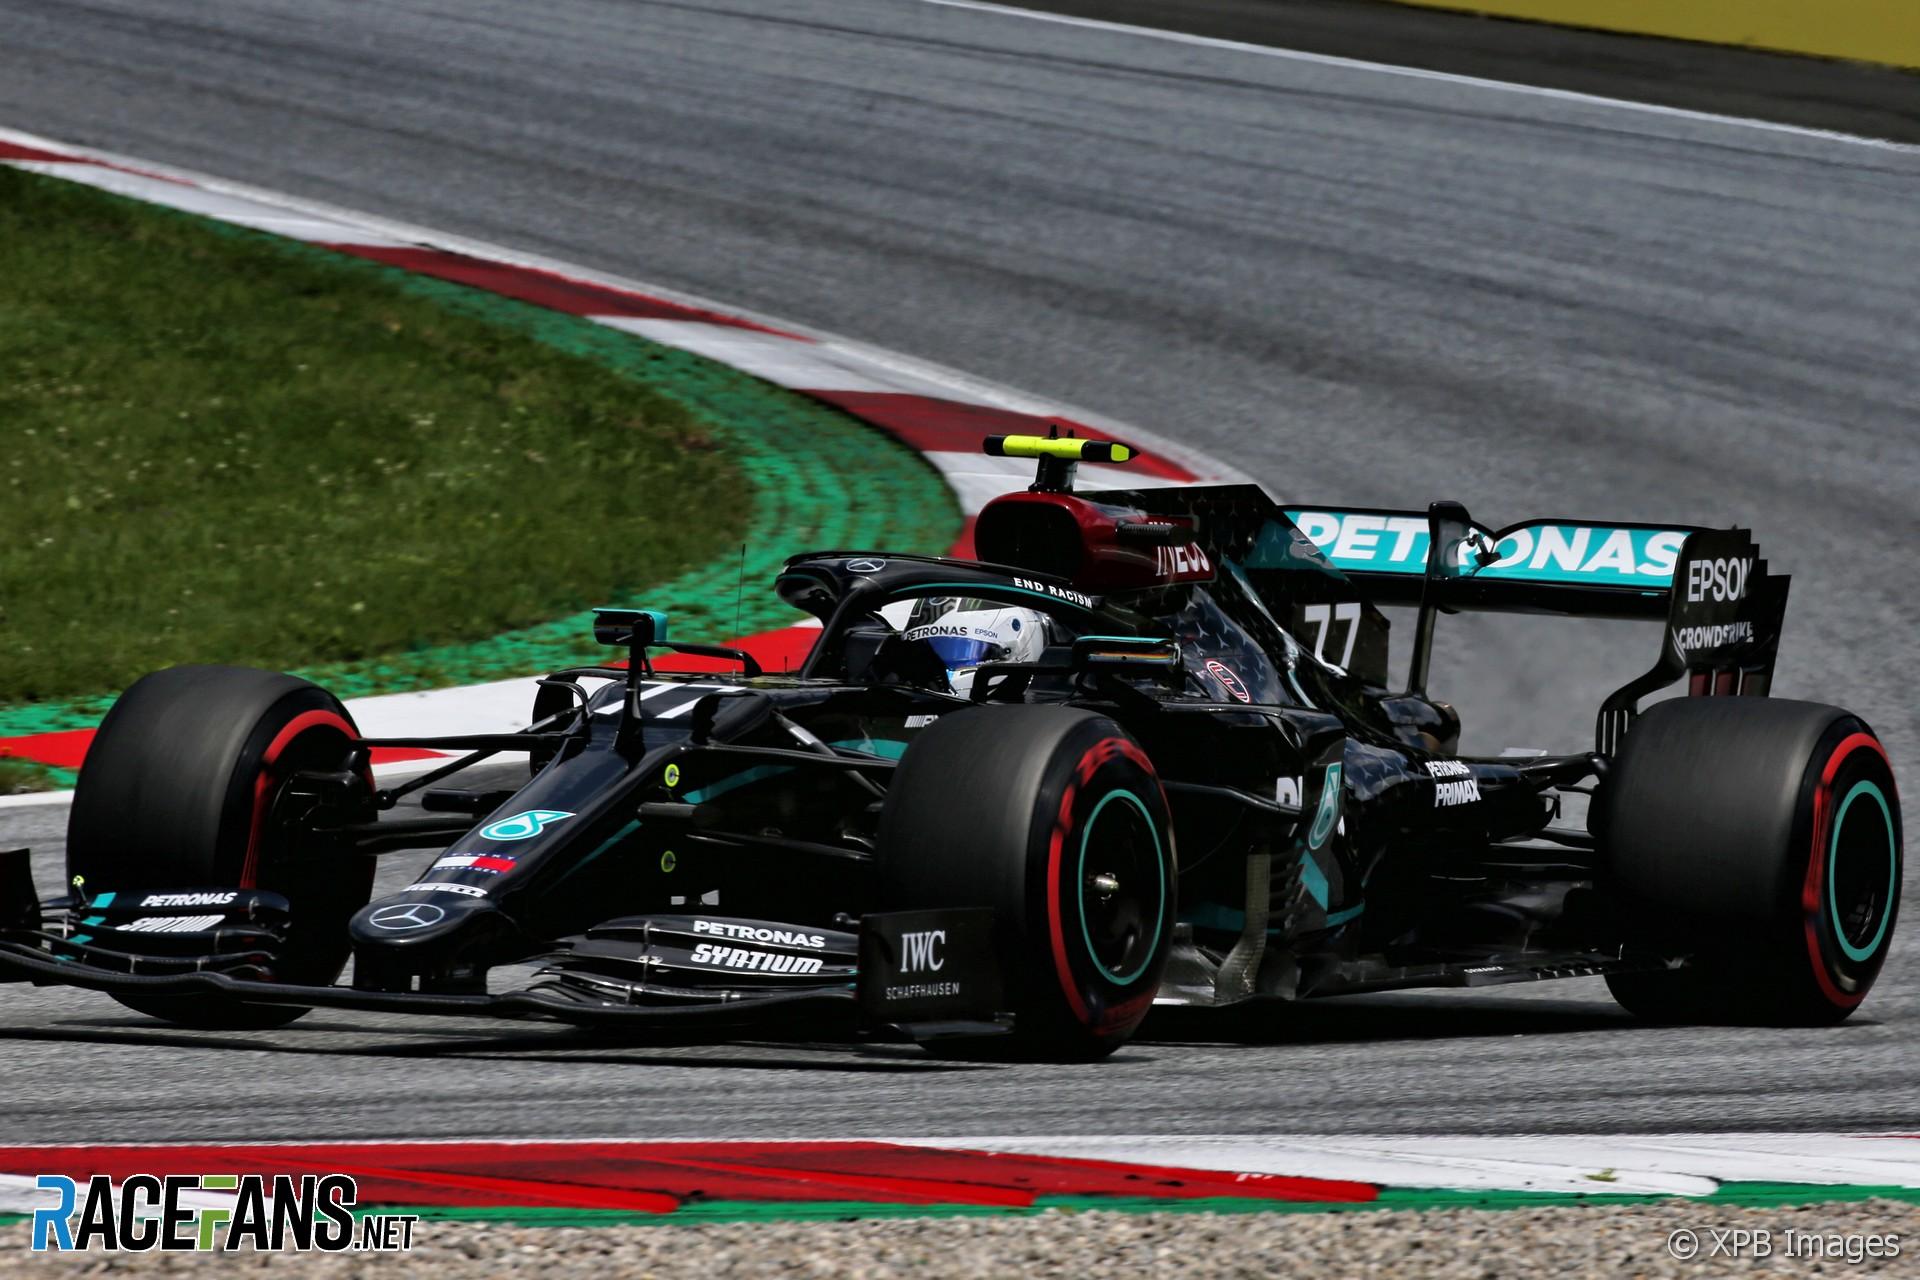 2020 Austrian Grand Prix F1 Starting Grid Racefans